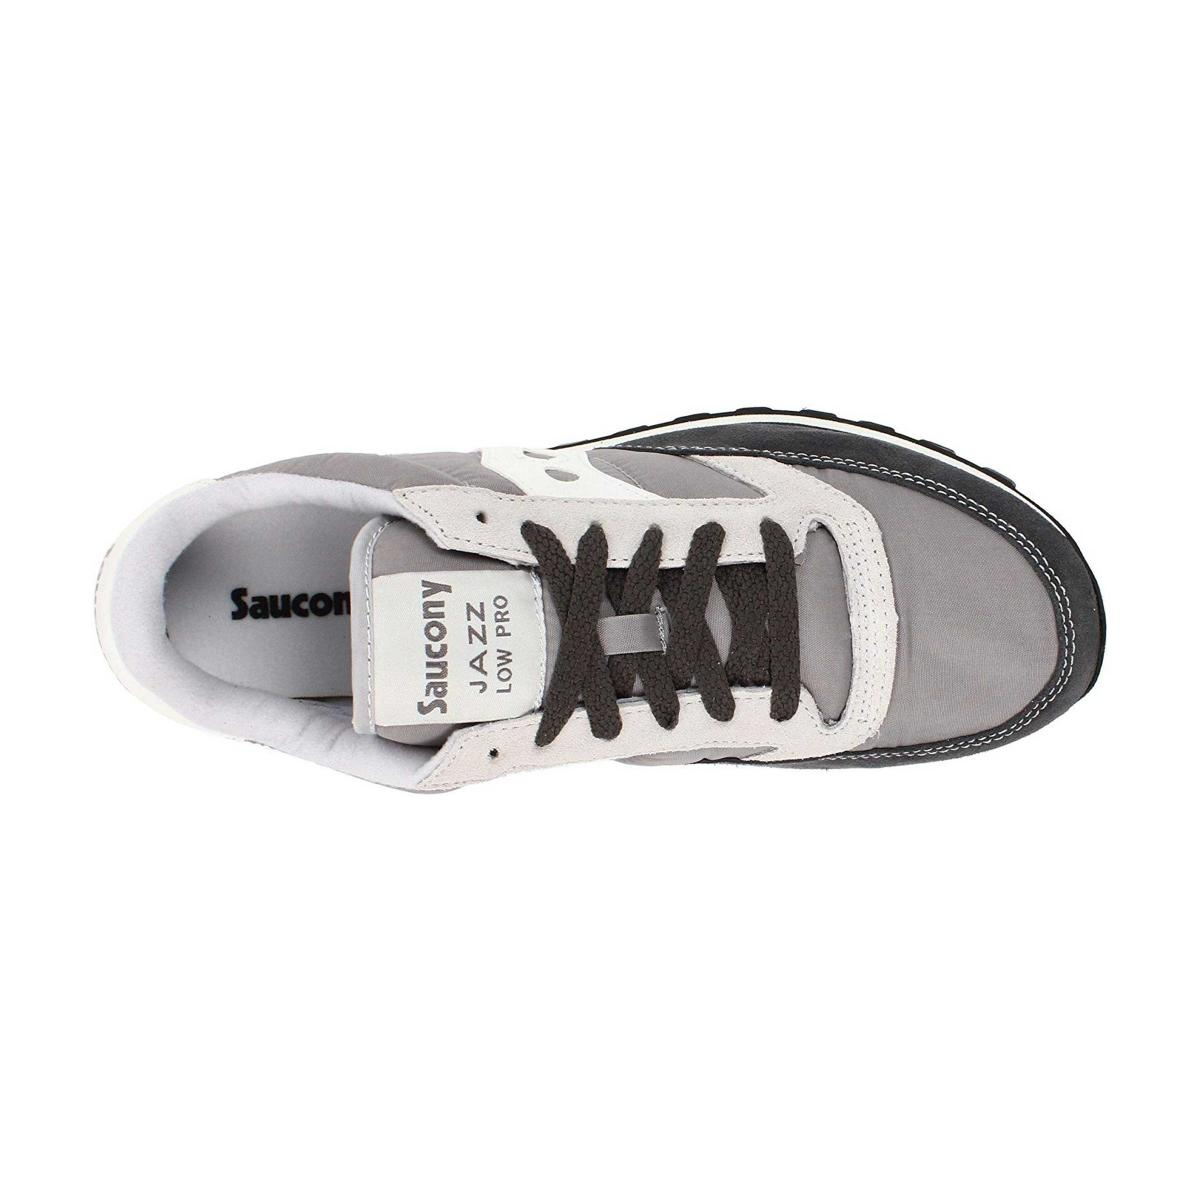 Scarpe Sneakers Saucony Jazz Low Pro Uomo rif. 2866-9